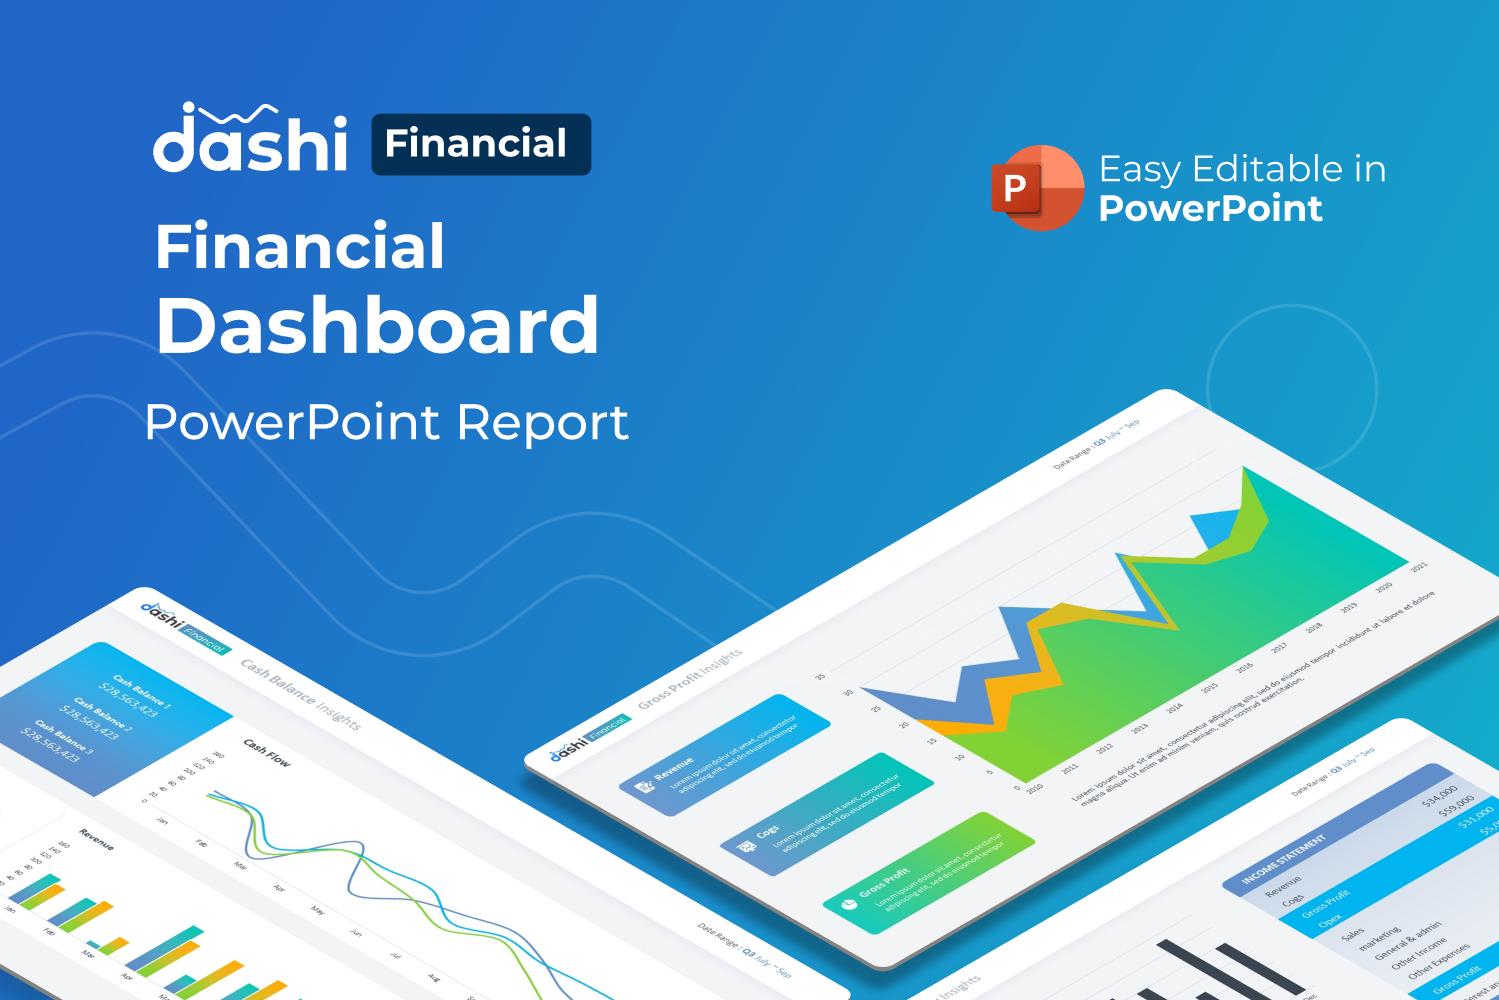 Dashi Financial – Financial Dashboard Report Presentation PowerPoint Template